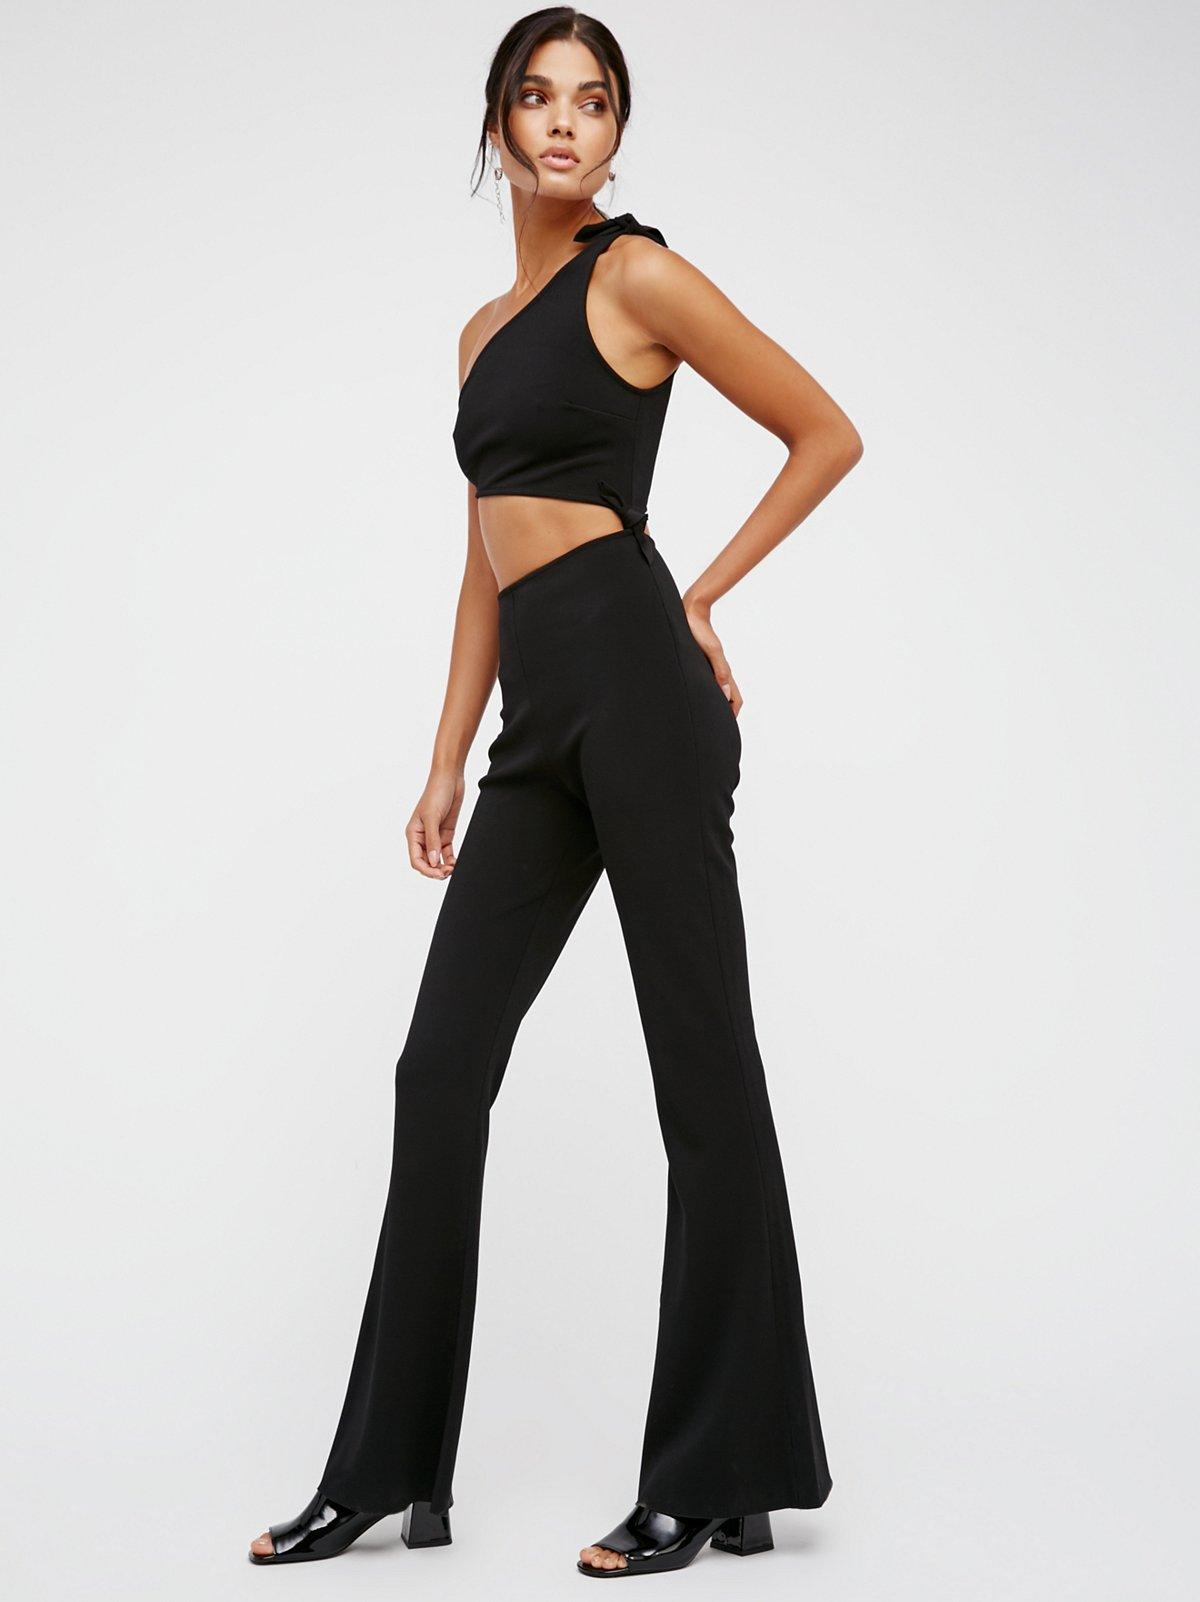 Onyx连体裤